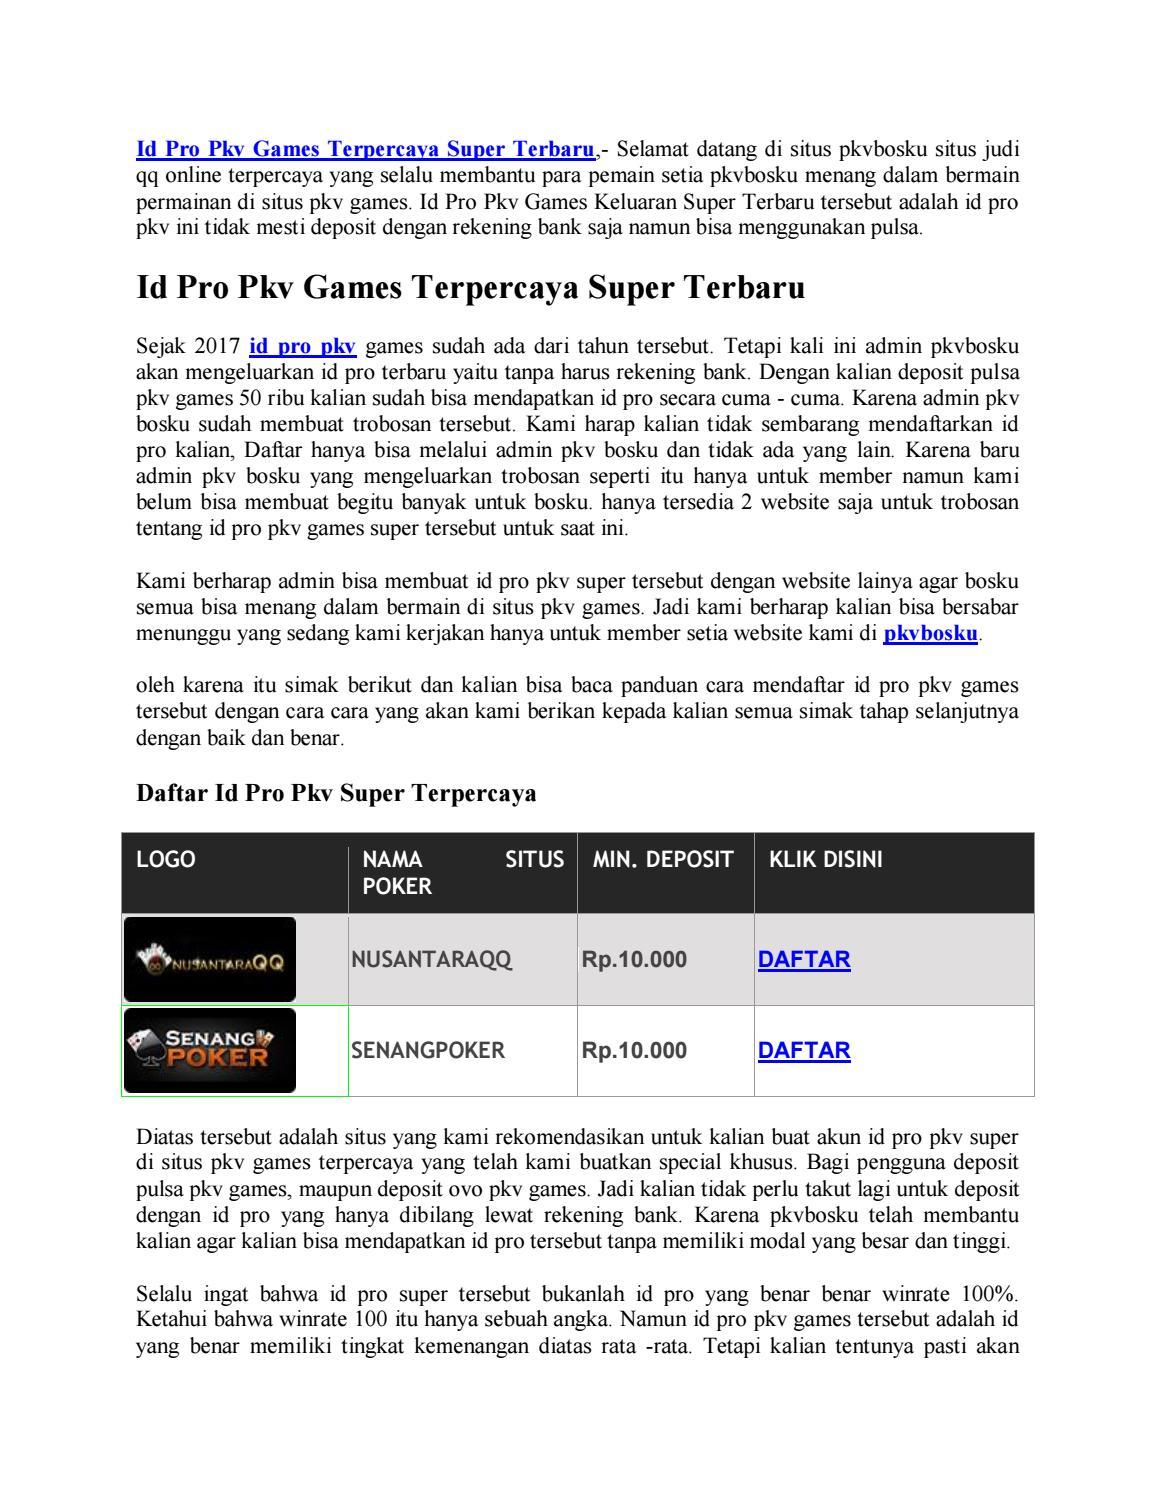 Id Pro Pkv Terpercaya Super Terbaru By Nusantaraqq Issuu